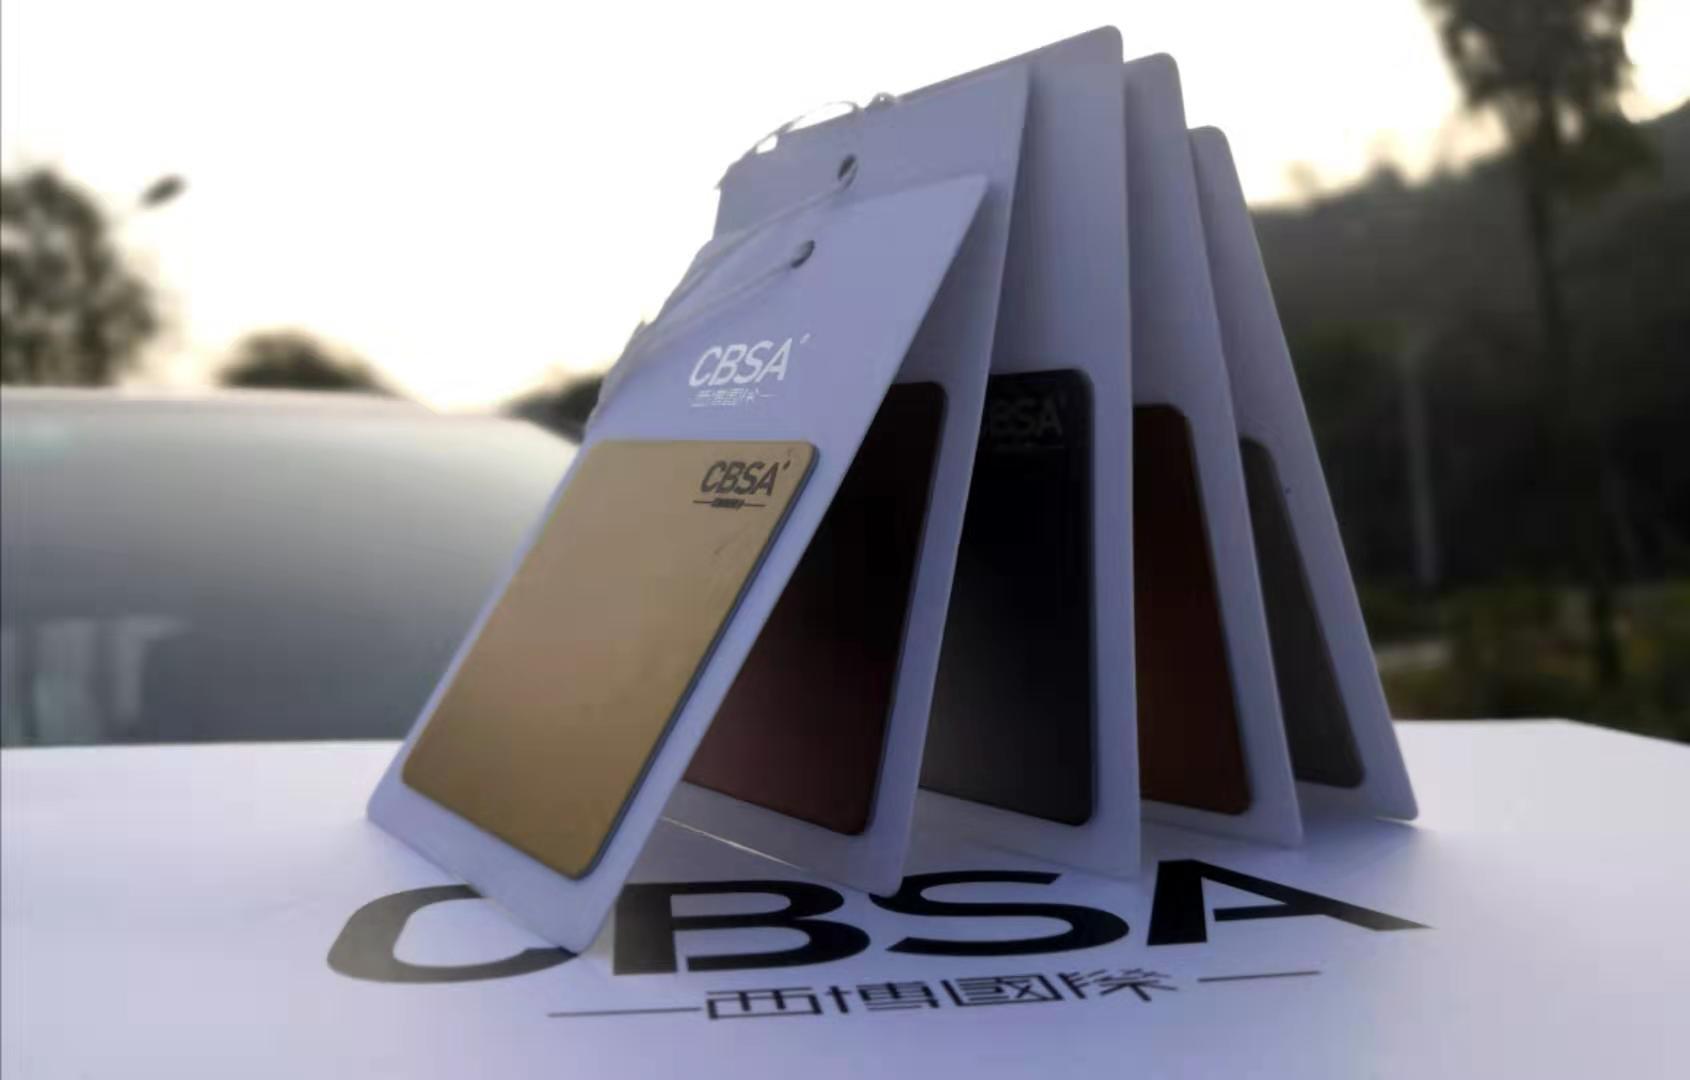 CBSA international product introduction